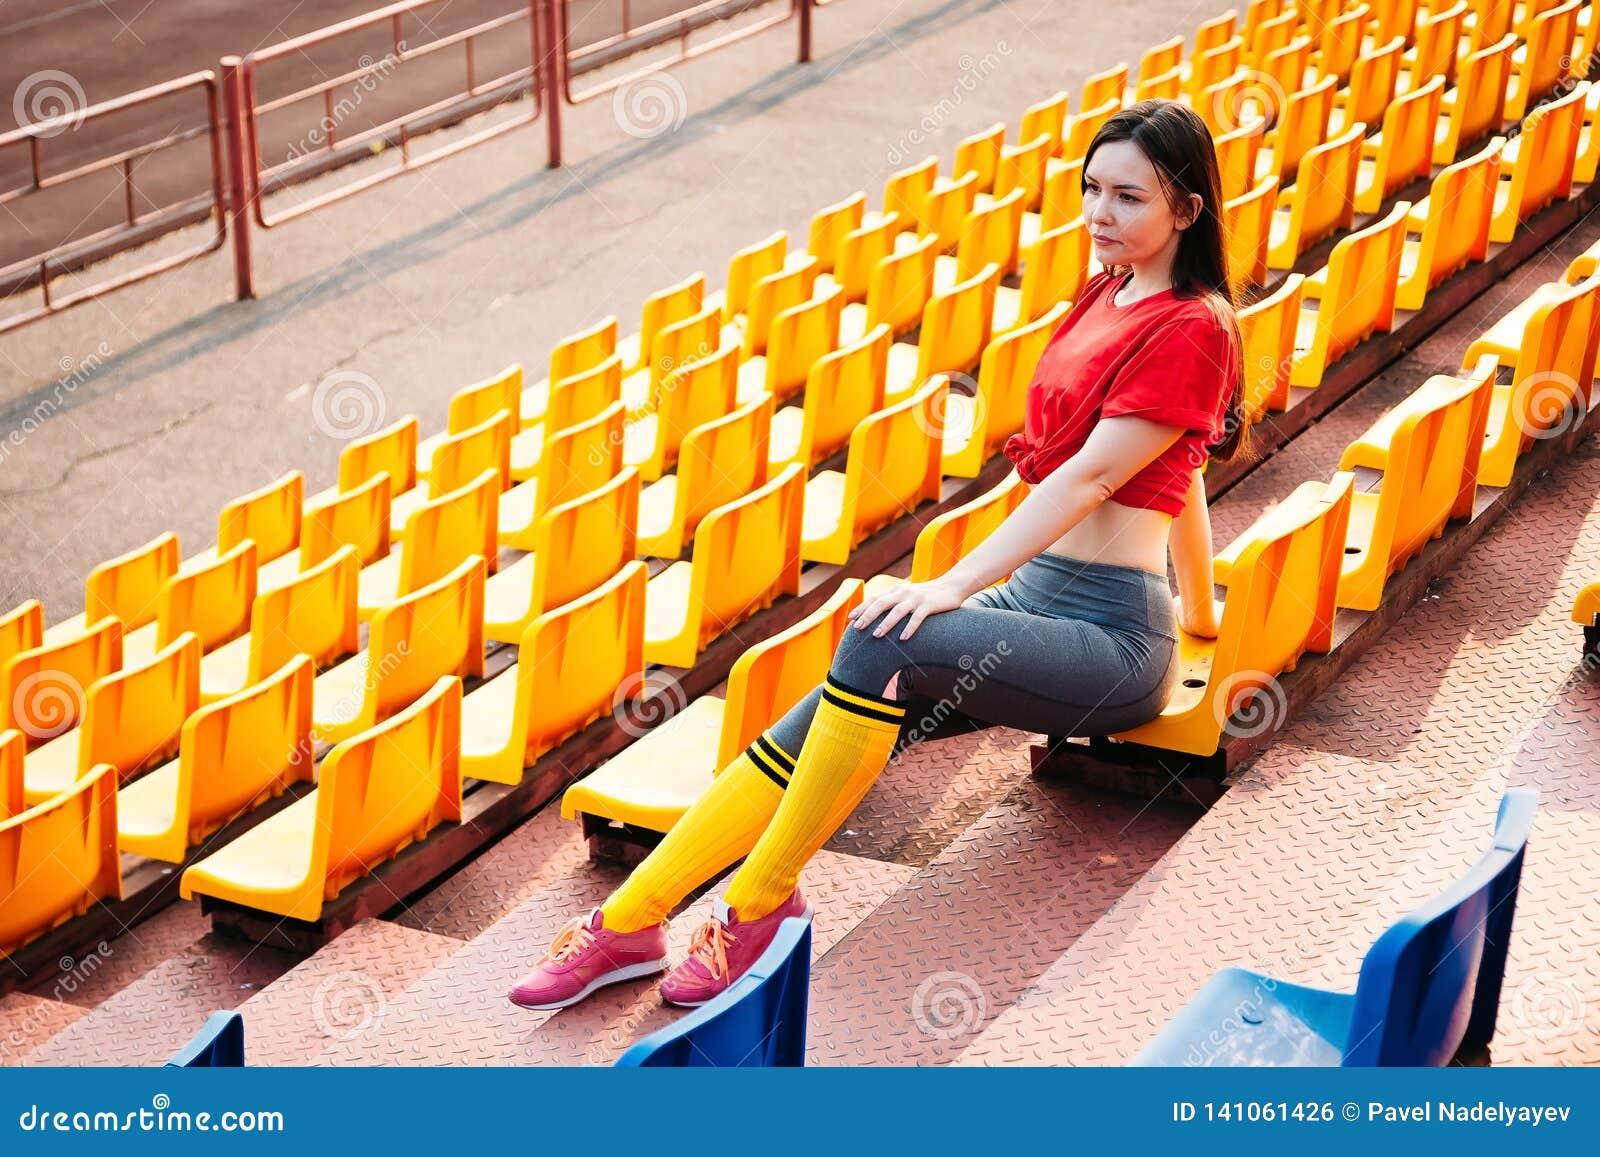 Молодая женщина спорт в sportswear на трибуне стадиона сидит на стенде